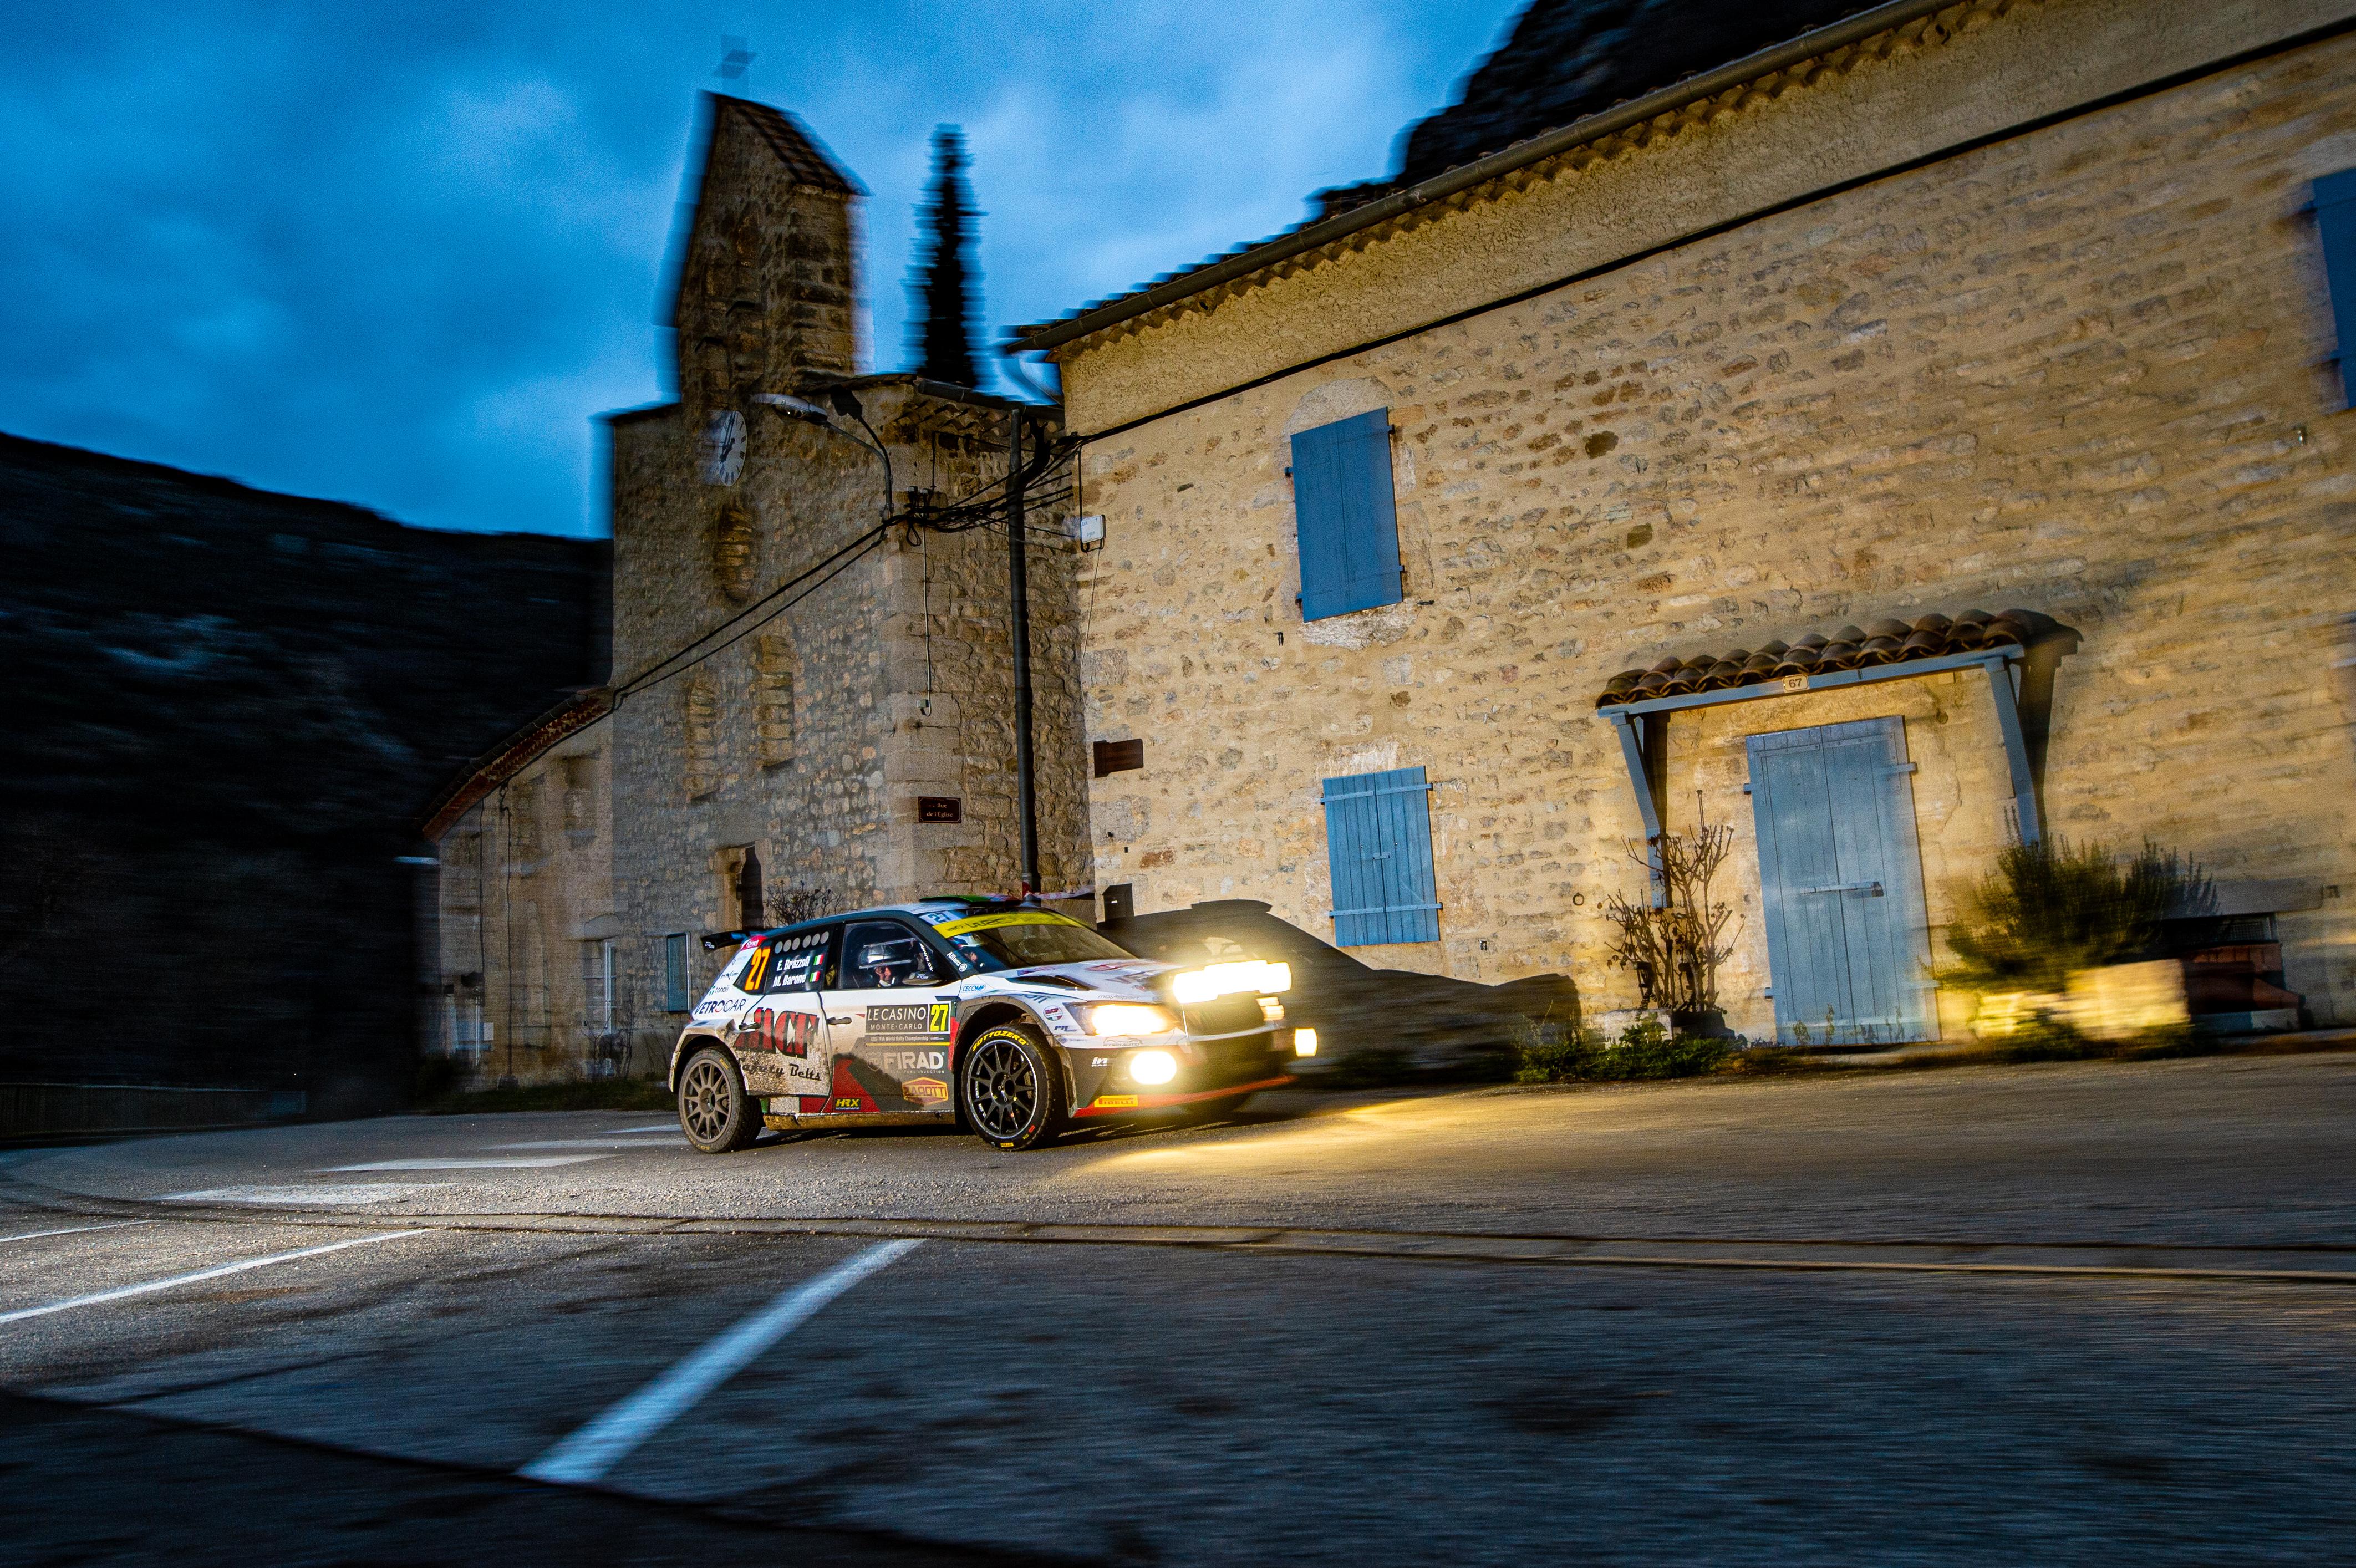 Rallye Monte-Carlo: SKODA FABIA Rally2 evo driver Mikkelsen starts as WRC2 leader into last leg - Image 4